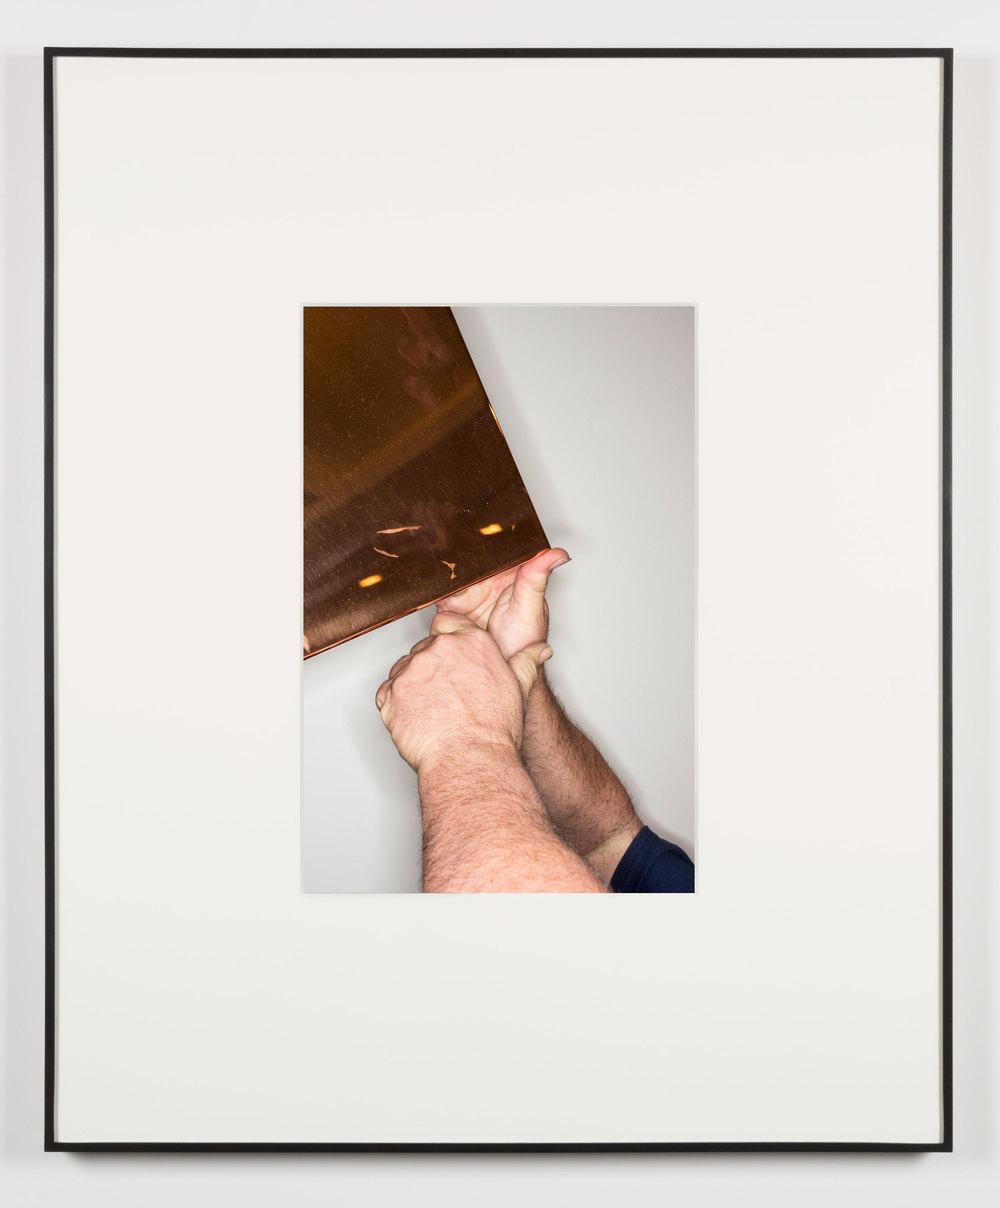 Das Gesicht des Terrors (Los Angeles, California, February 20, 2014)    2014   Chromogenic print  20 x 13 1/2 inches   Art Handling, 2011–